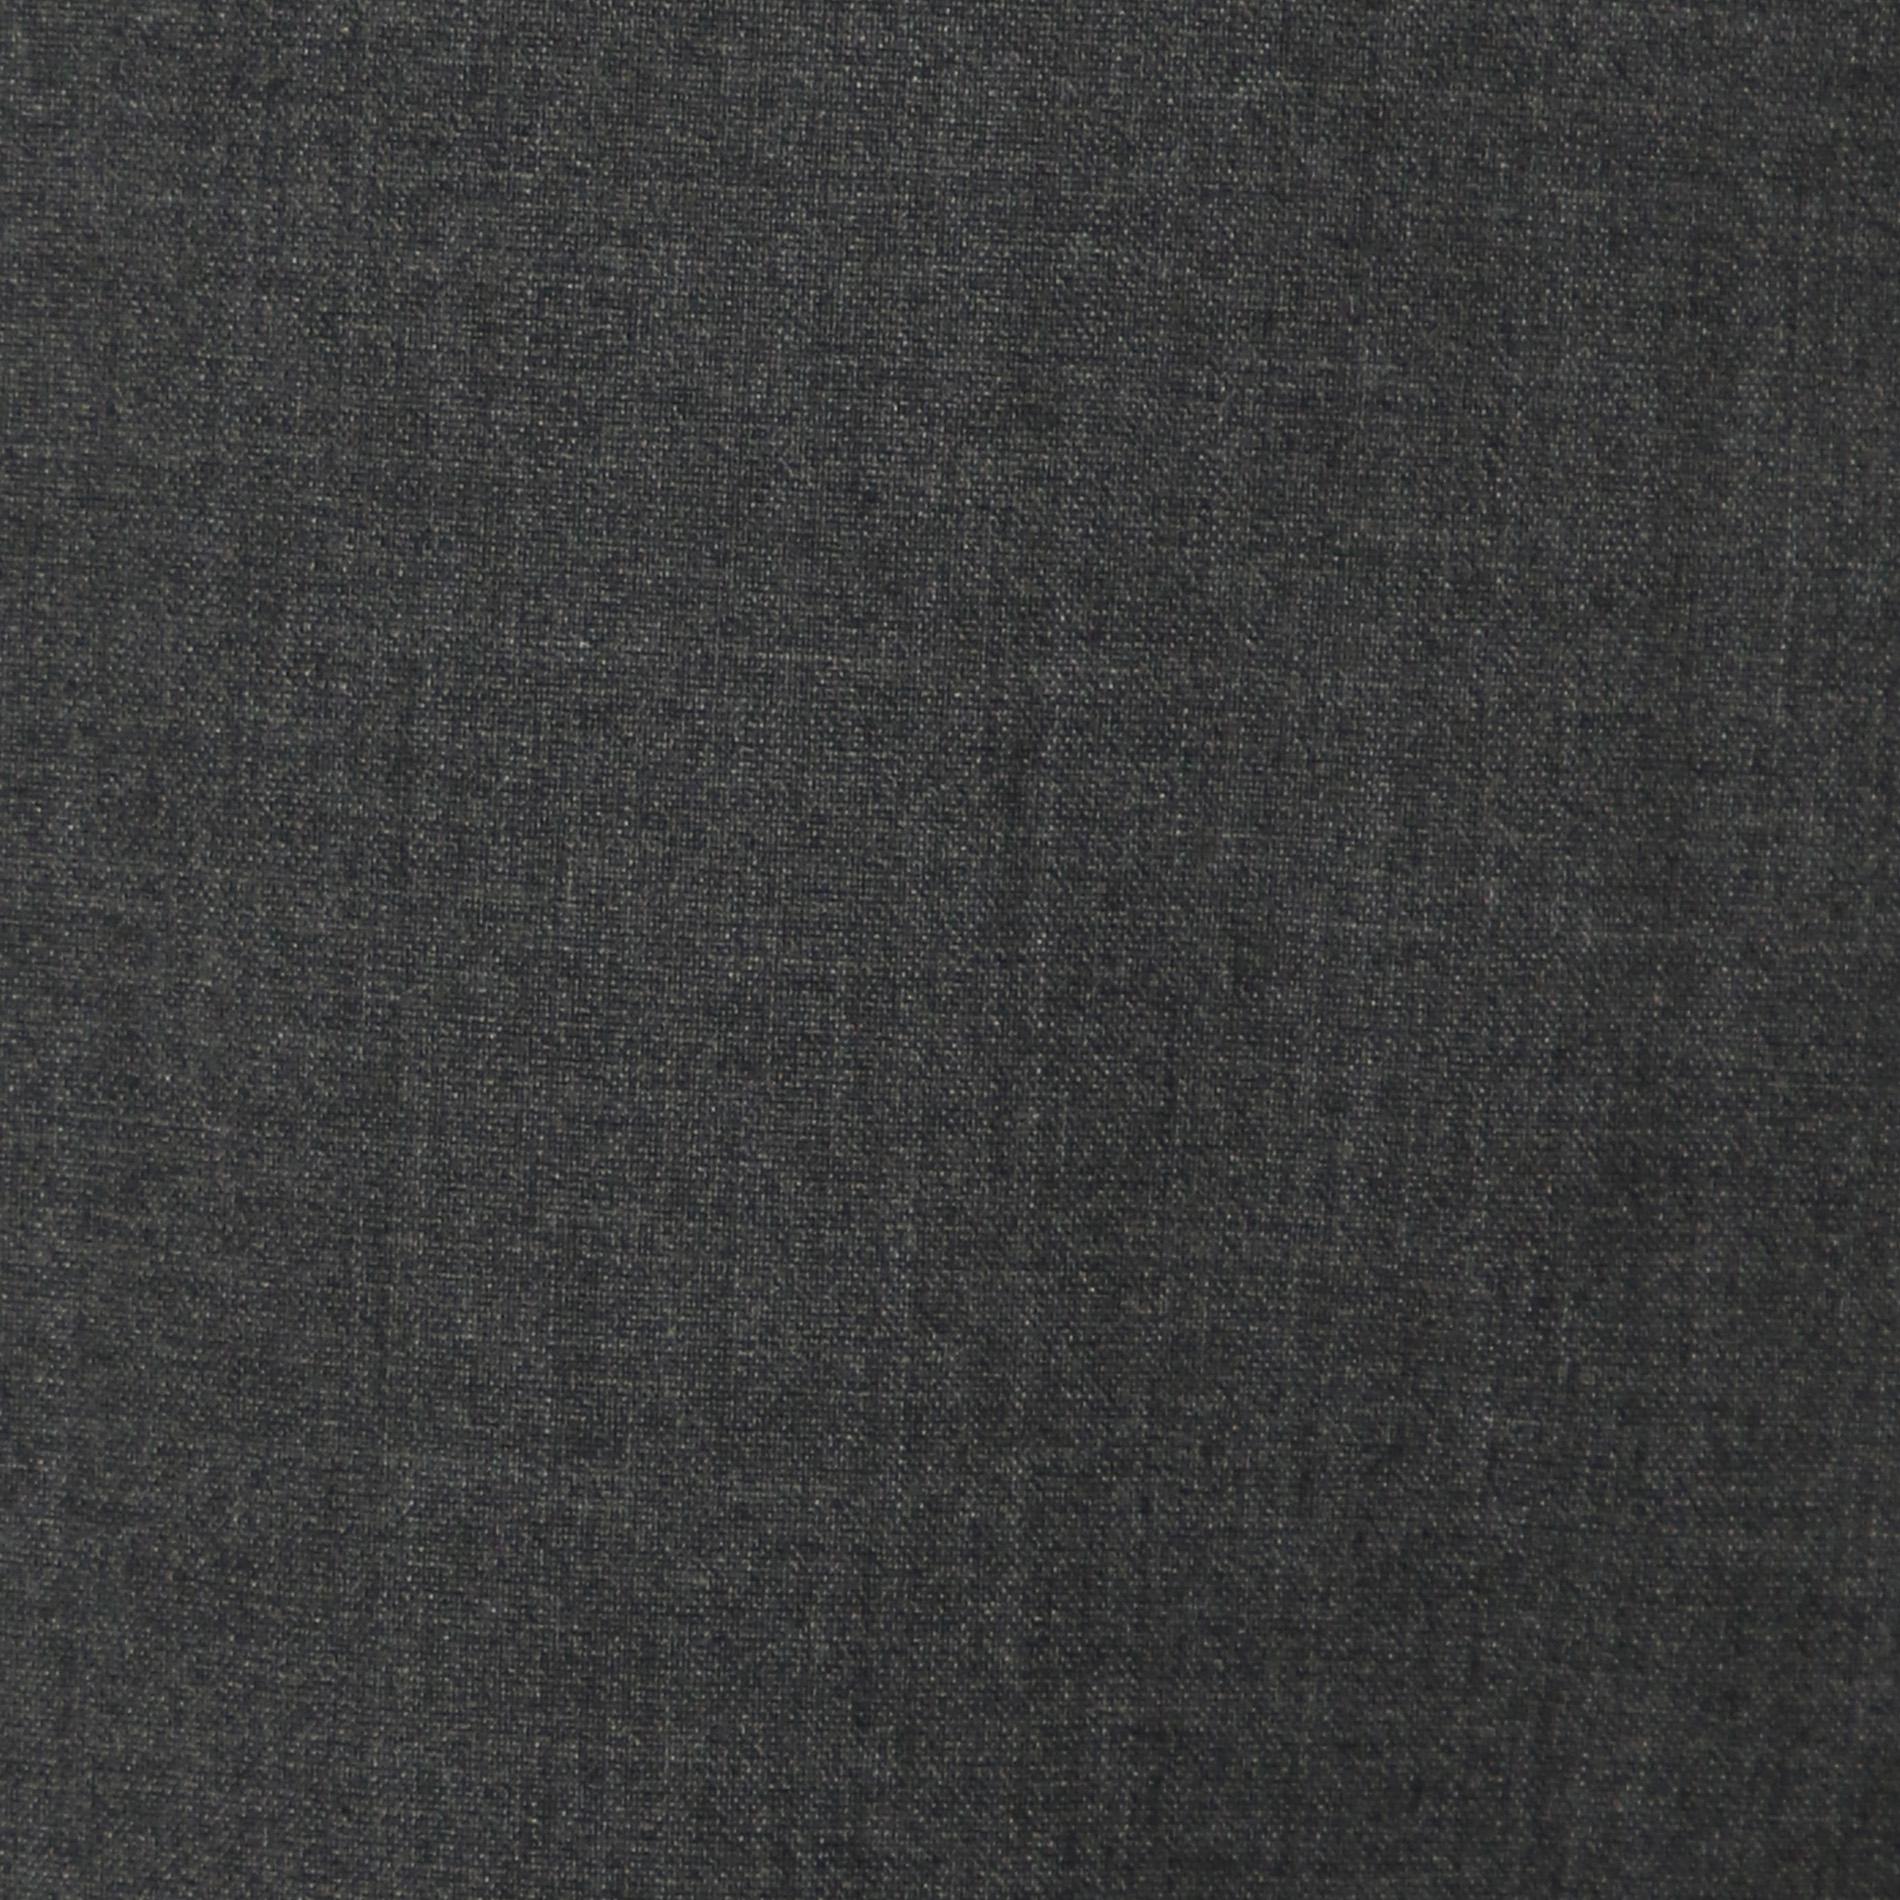 【Breasy Jacket】セットアップトロピカルセットアップパンツ